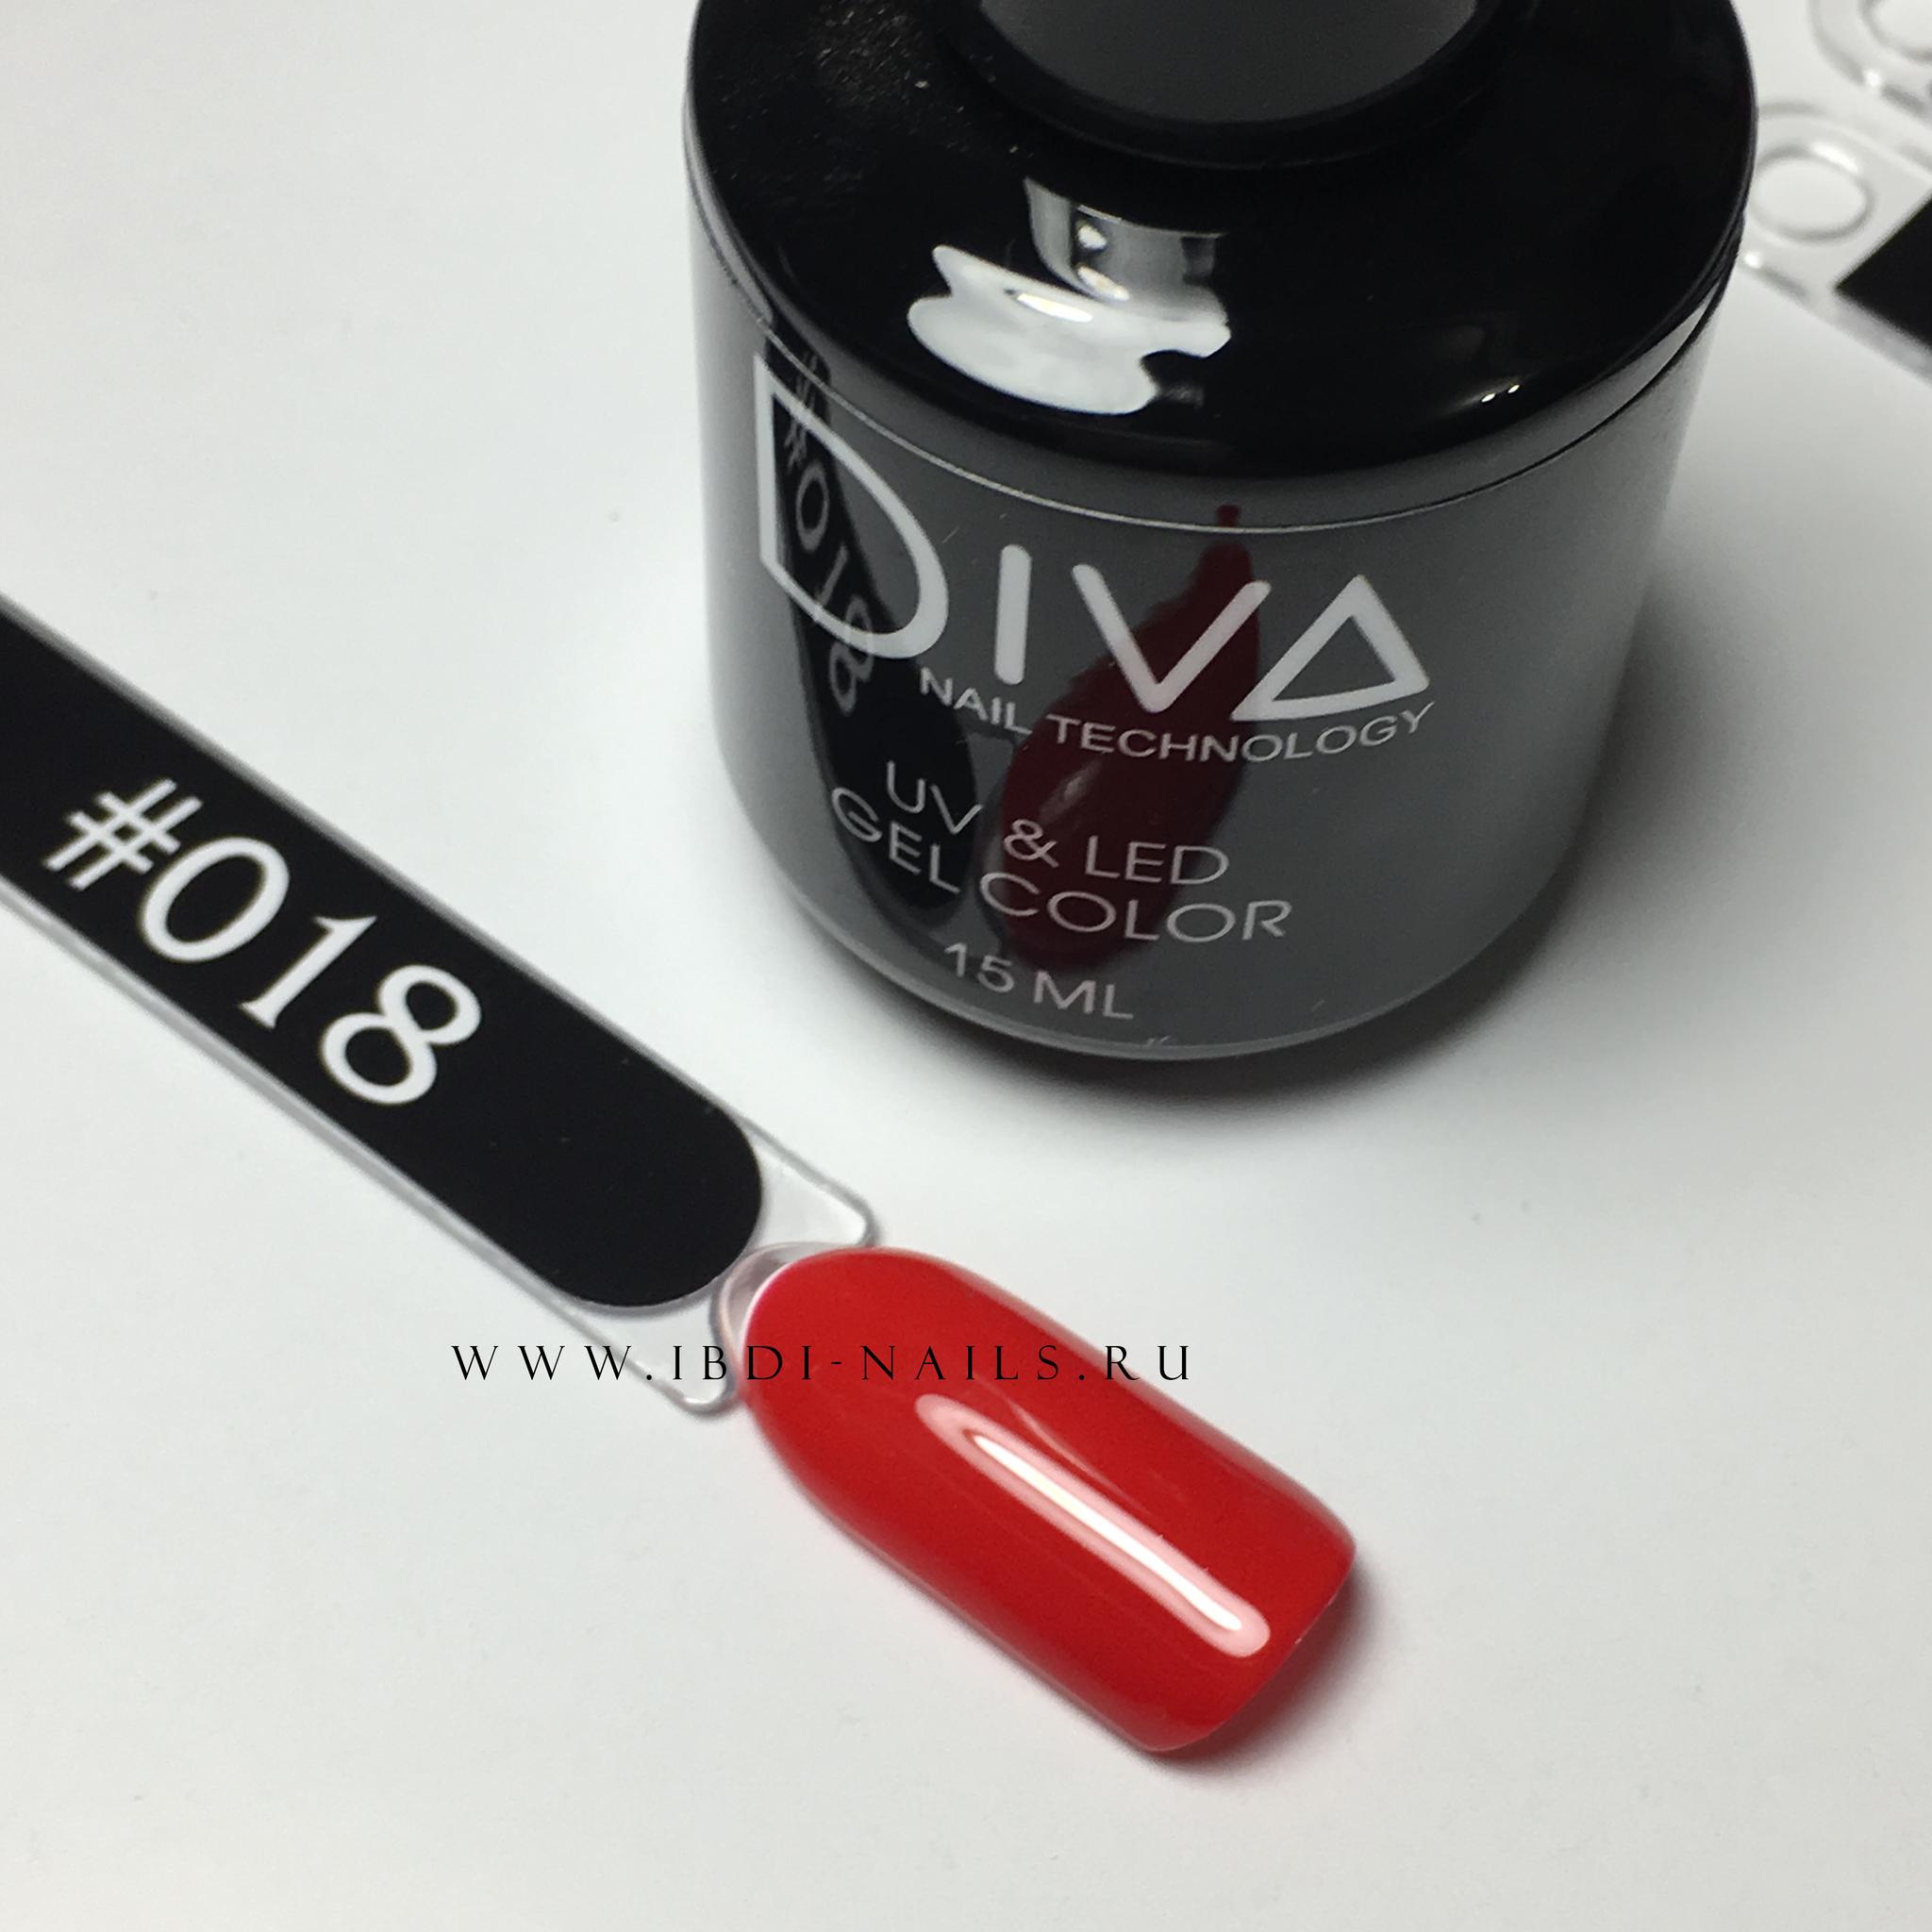 Гель-лак DIVA 018 15мл